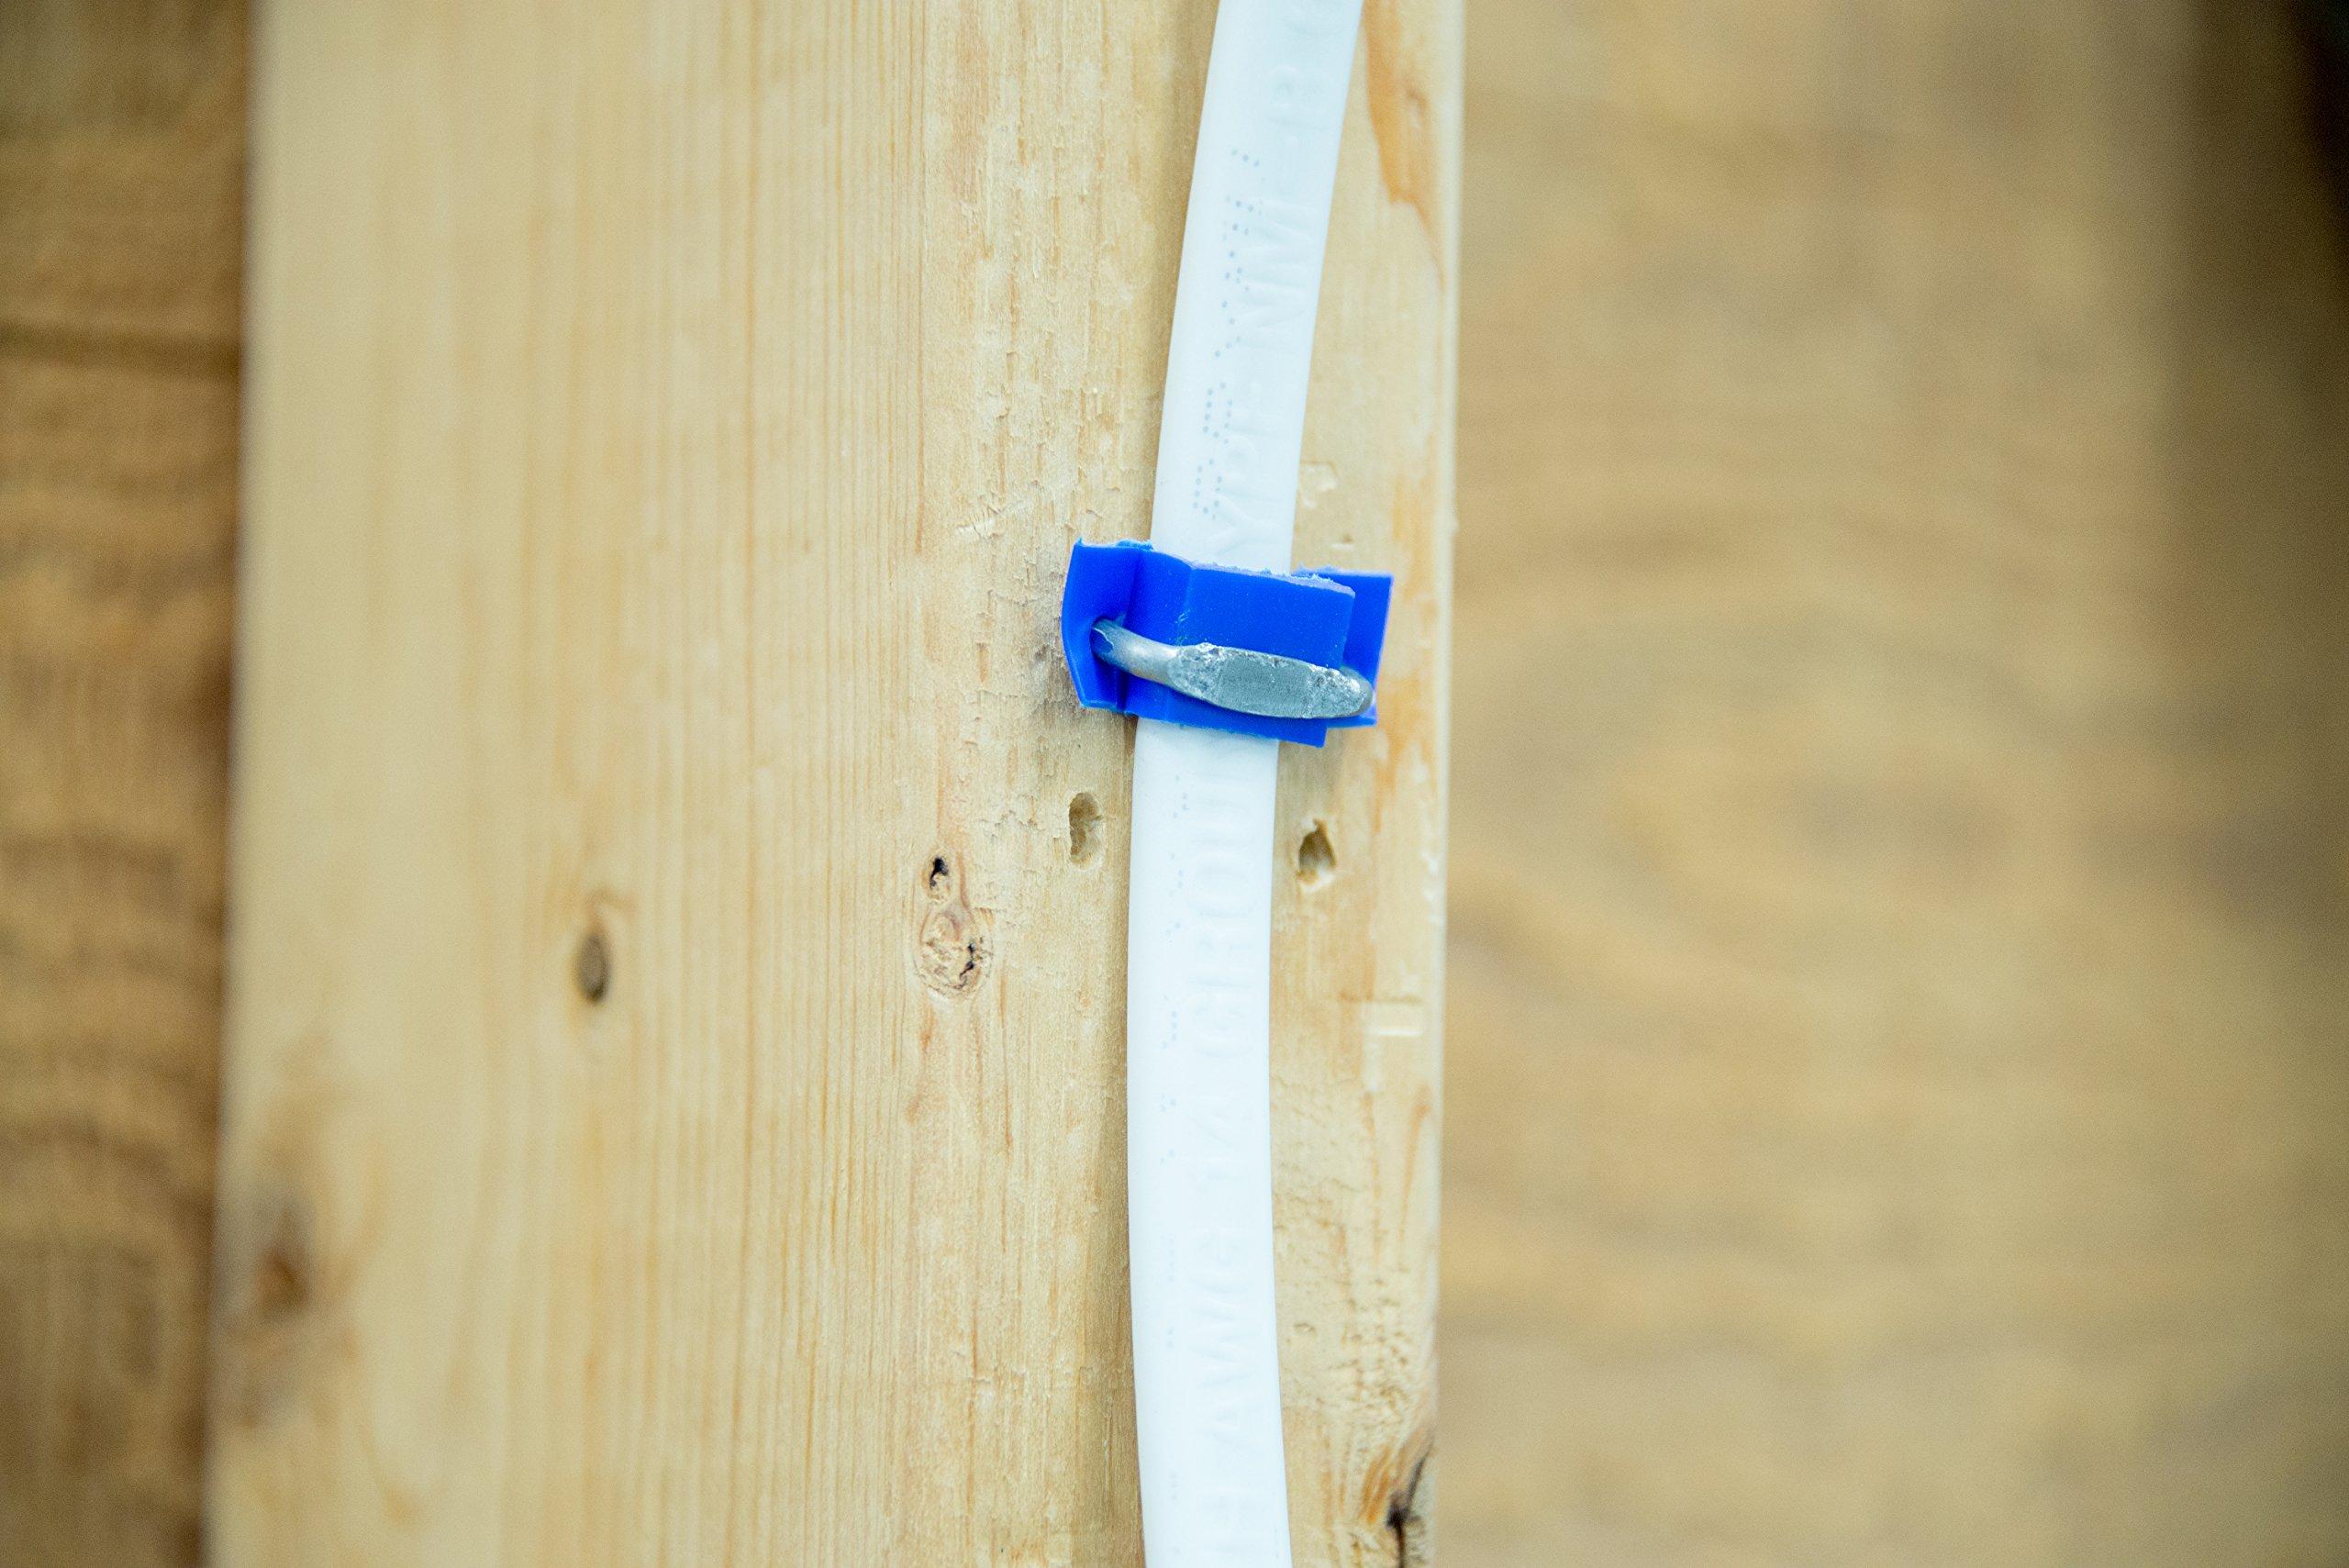 Gardner Bender MSI-950B Polyethylene Insulated Metal Staple, 1/2 in.,14/2 & 12/2 (NM) Cable, Blue